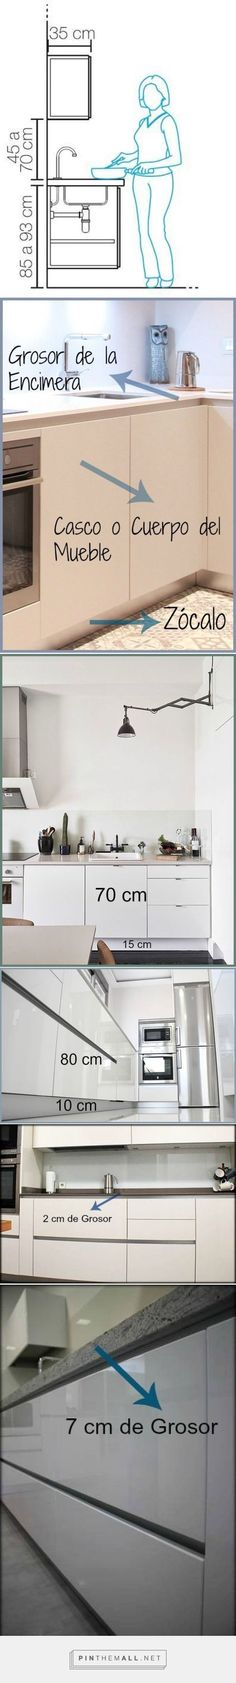 Pinterest Floor Plans House On House Wiring For Under Cabinet Lighting